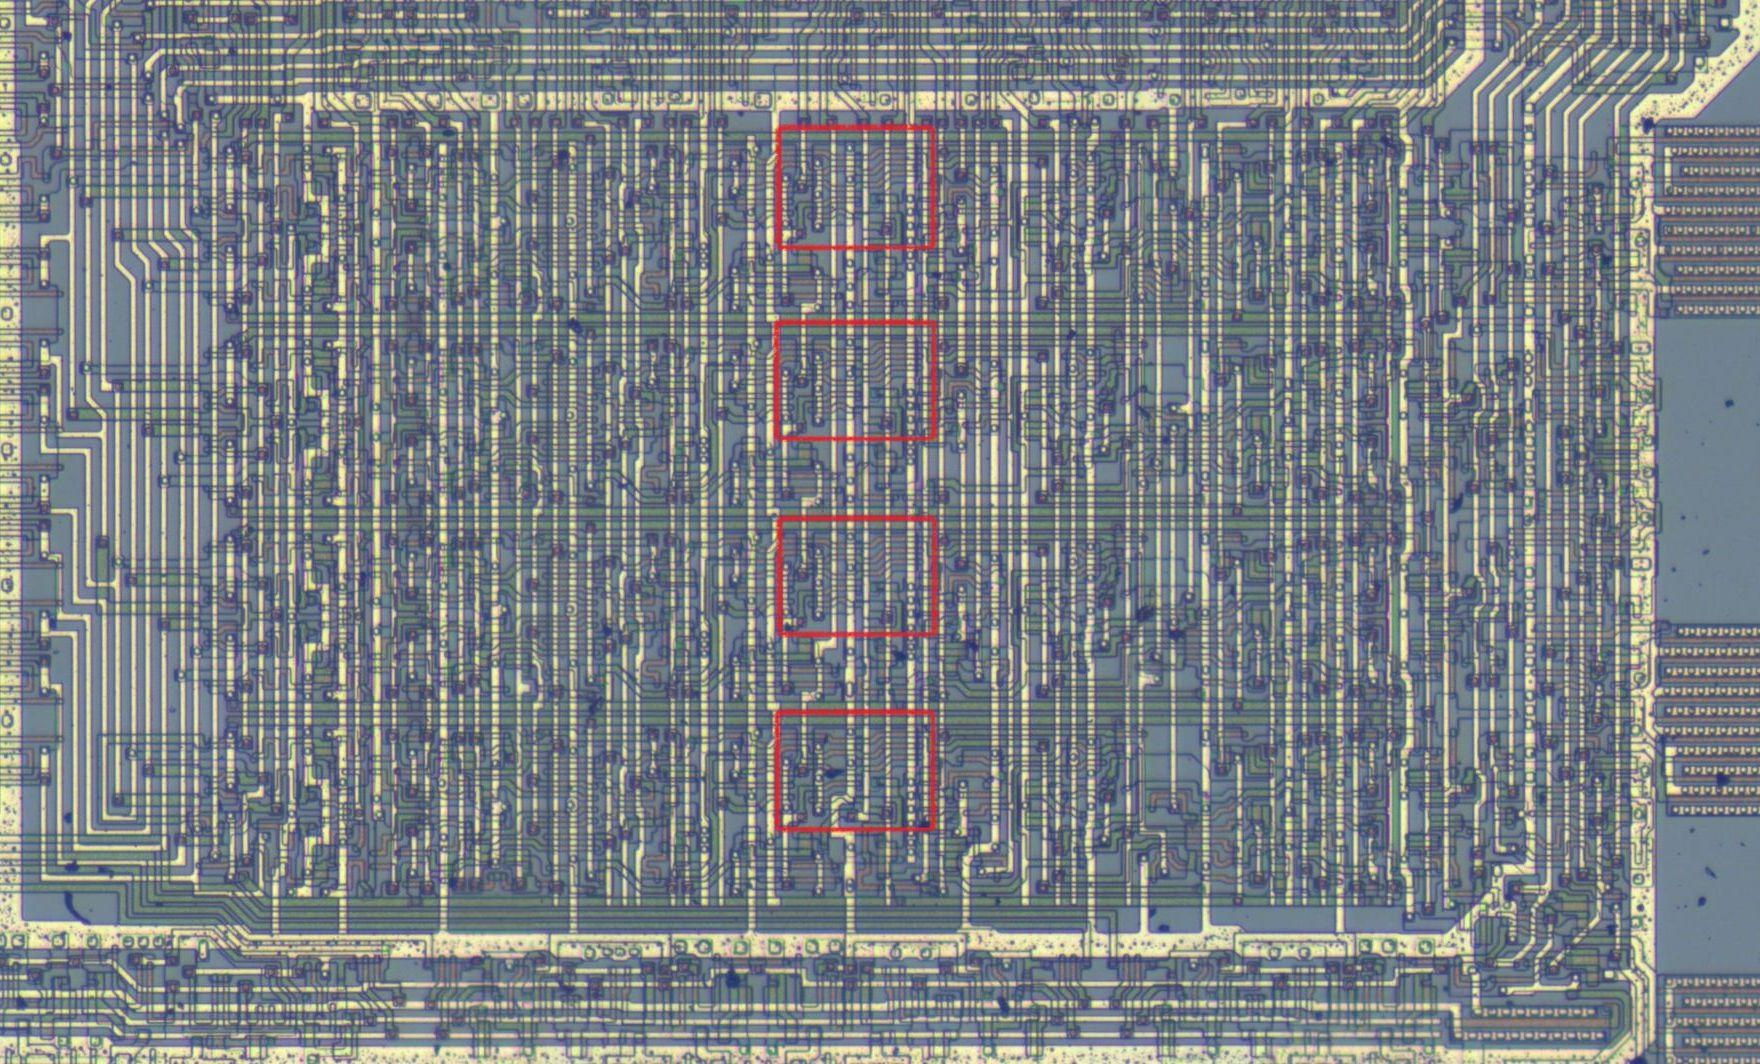 Реверс-инжиниринг микросхем по фото - 13